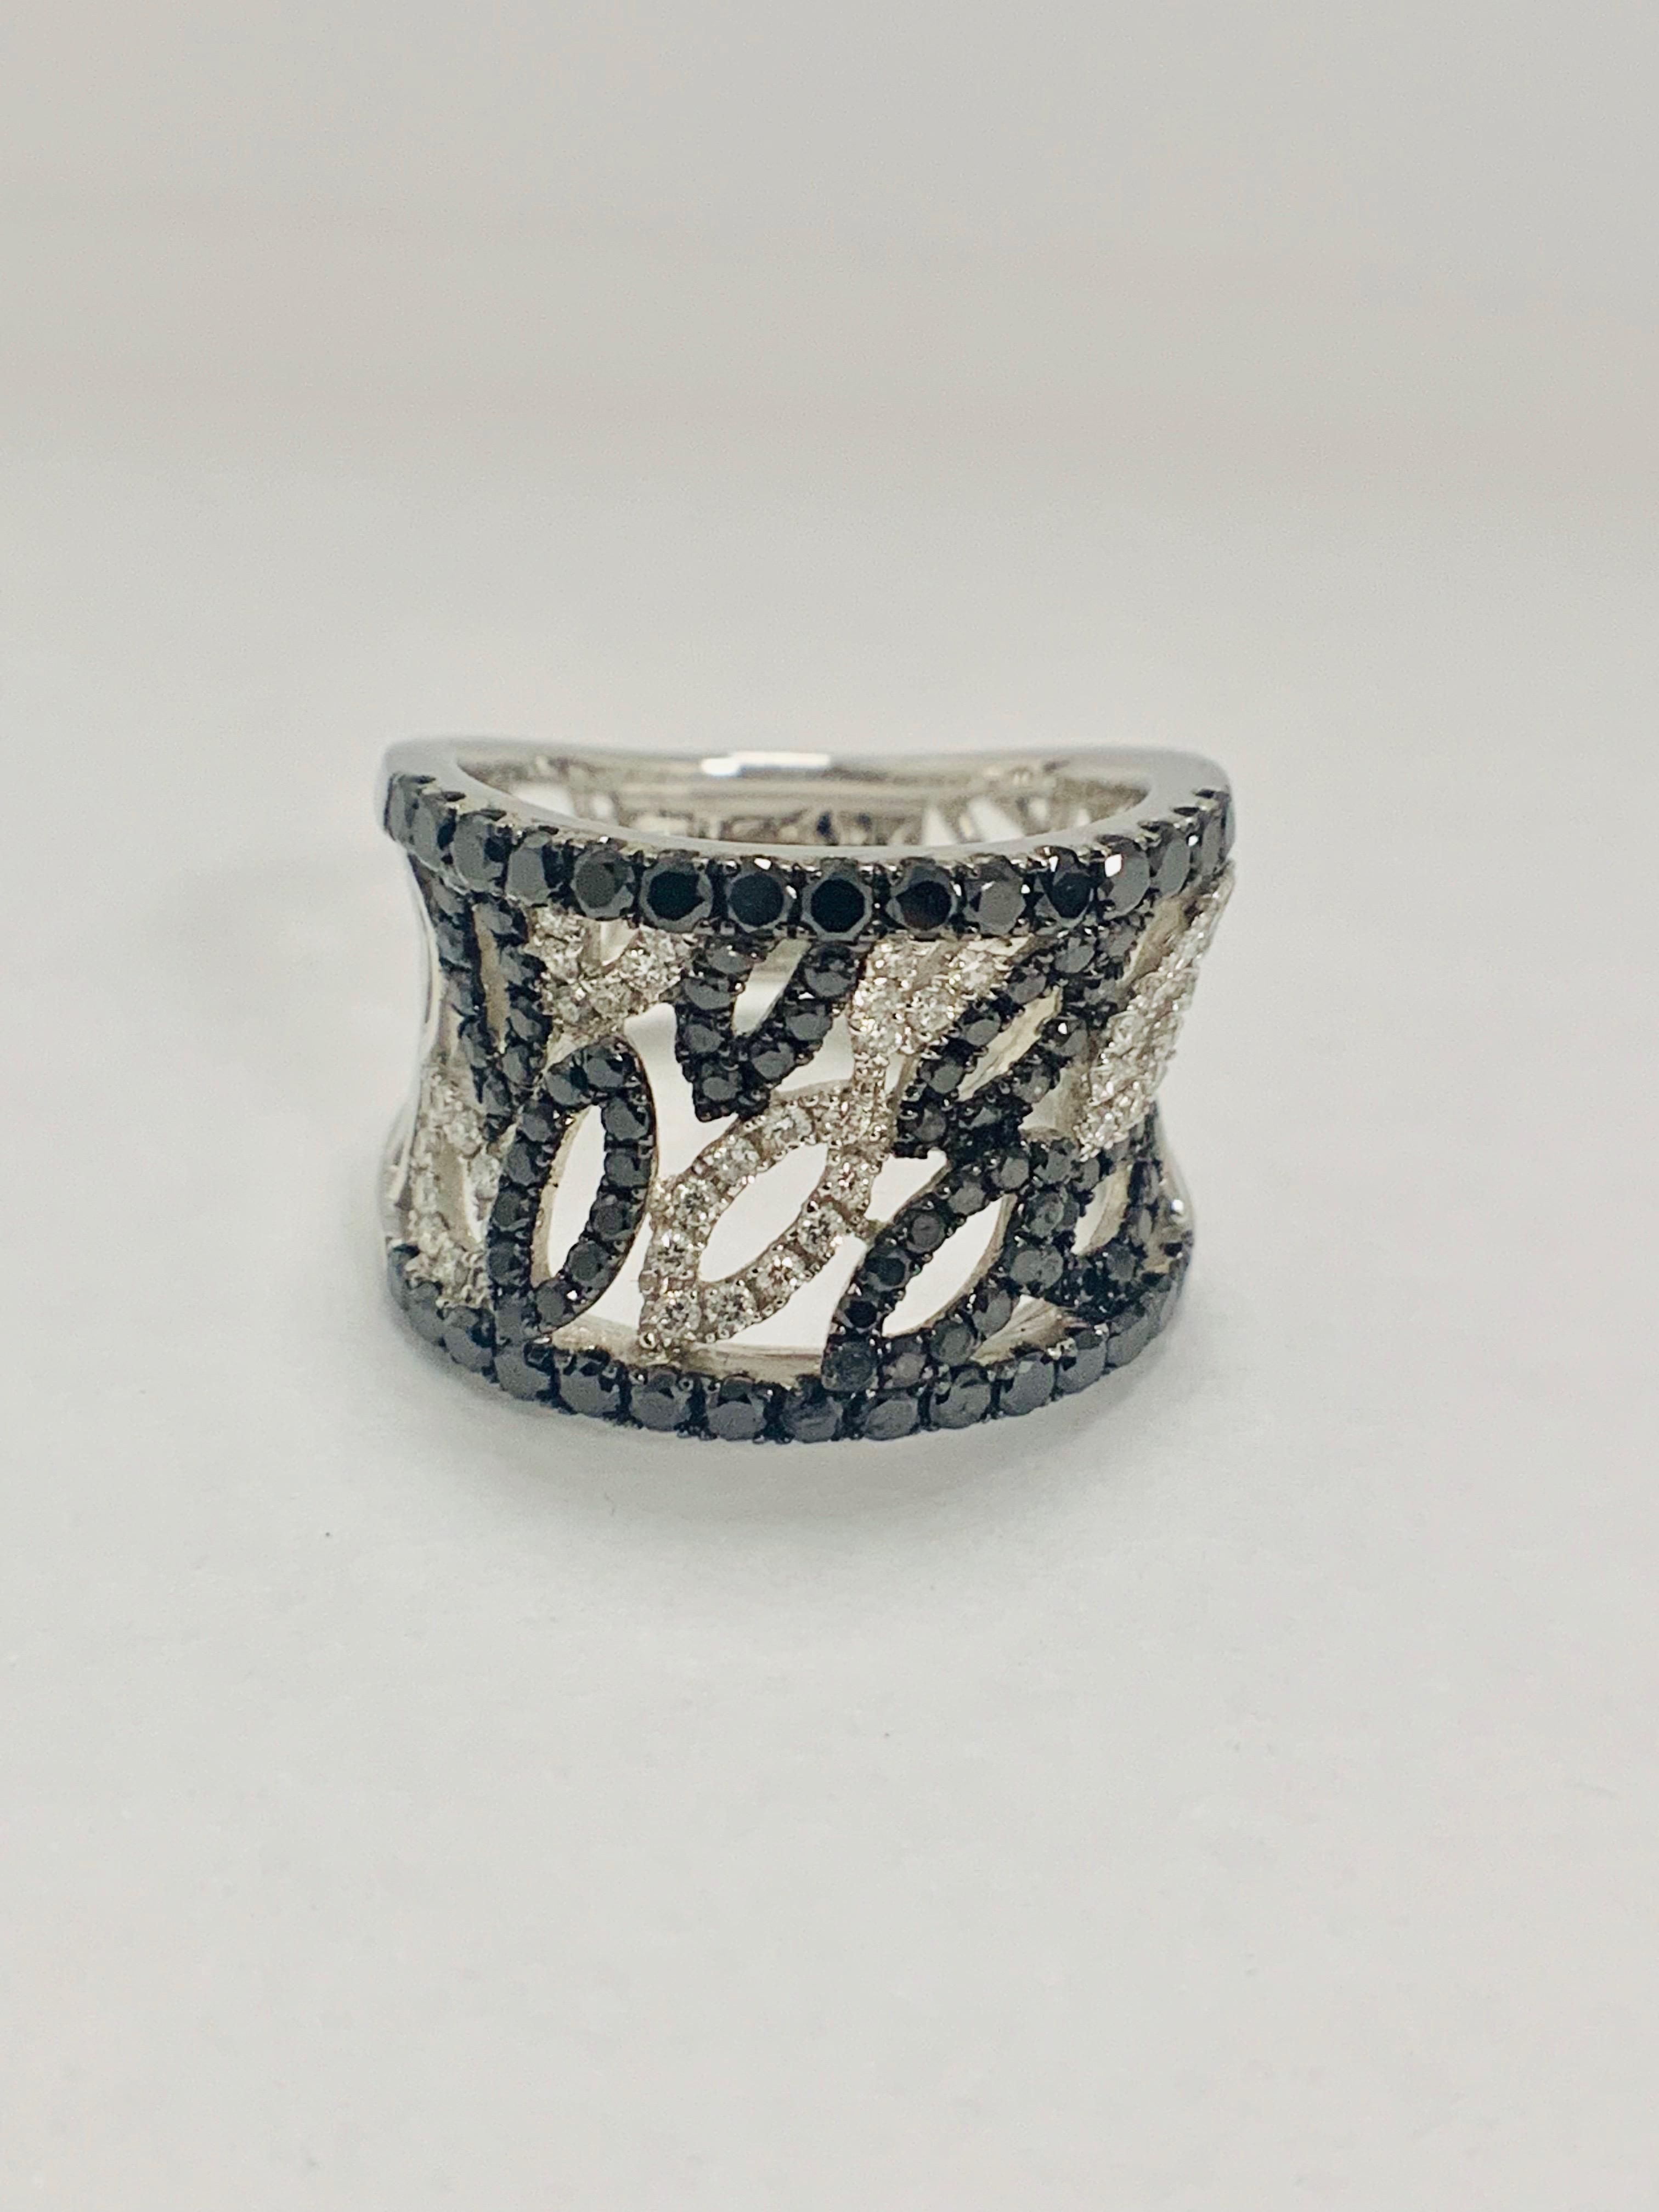 18ct White Gold Diamond ring featuring 90 round cut, black Diamonds (1.14ct TBDW) - Image 3 of 15